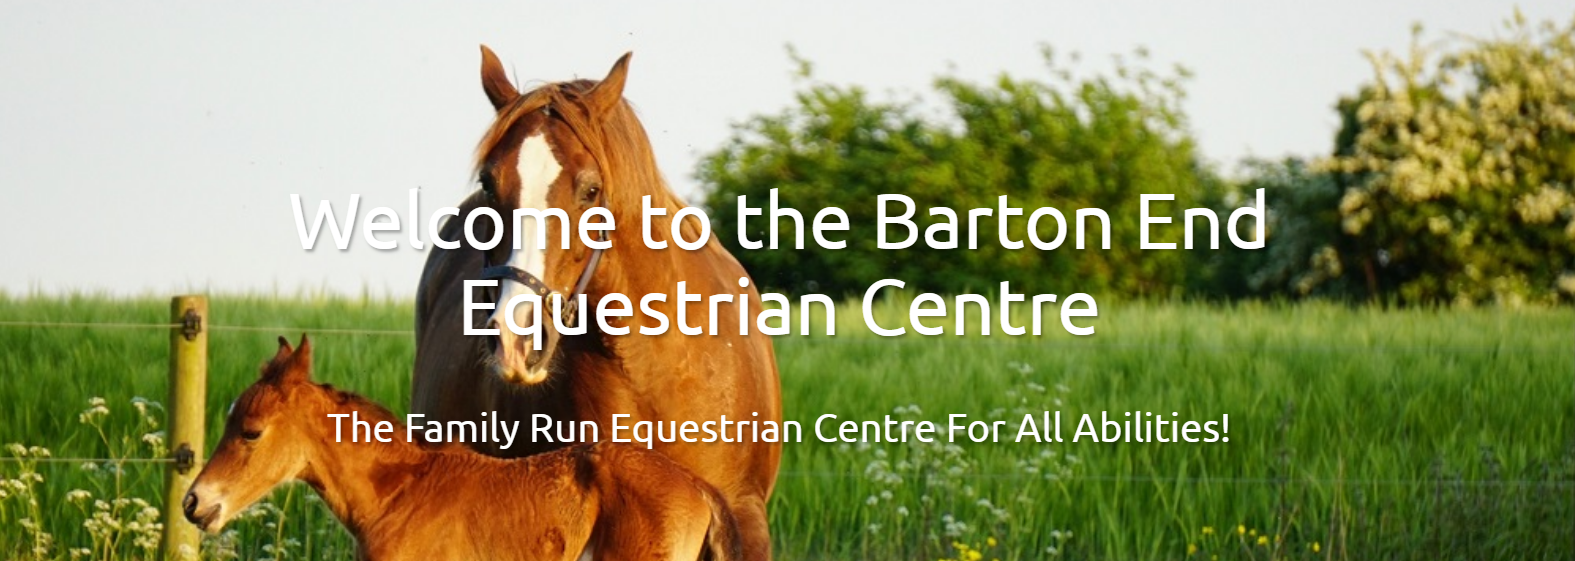 Hacking at Barton End Equestrain Centre Equestrian